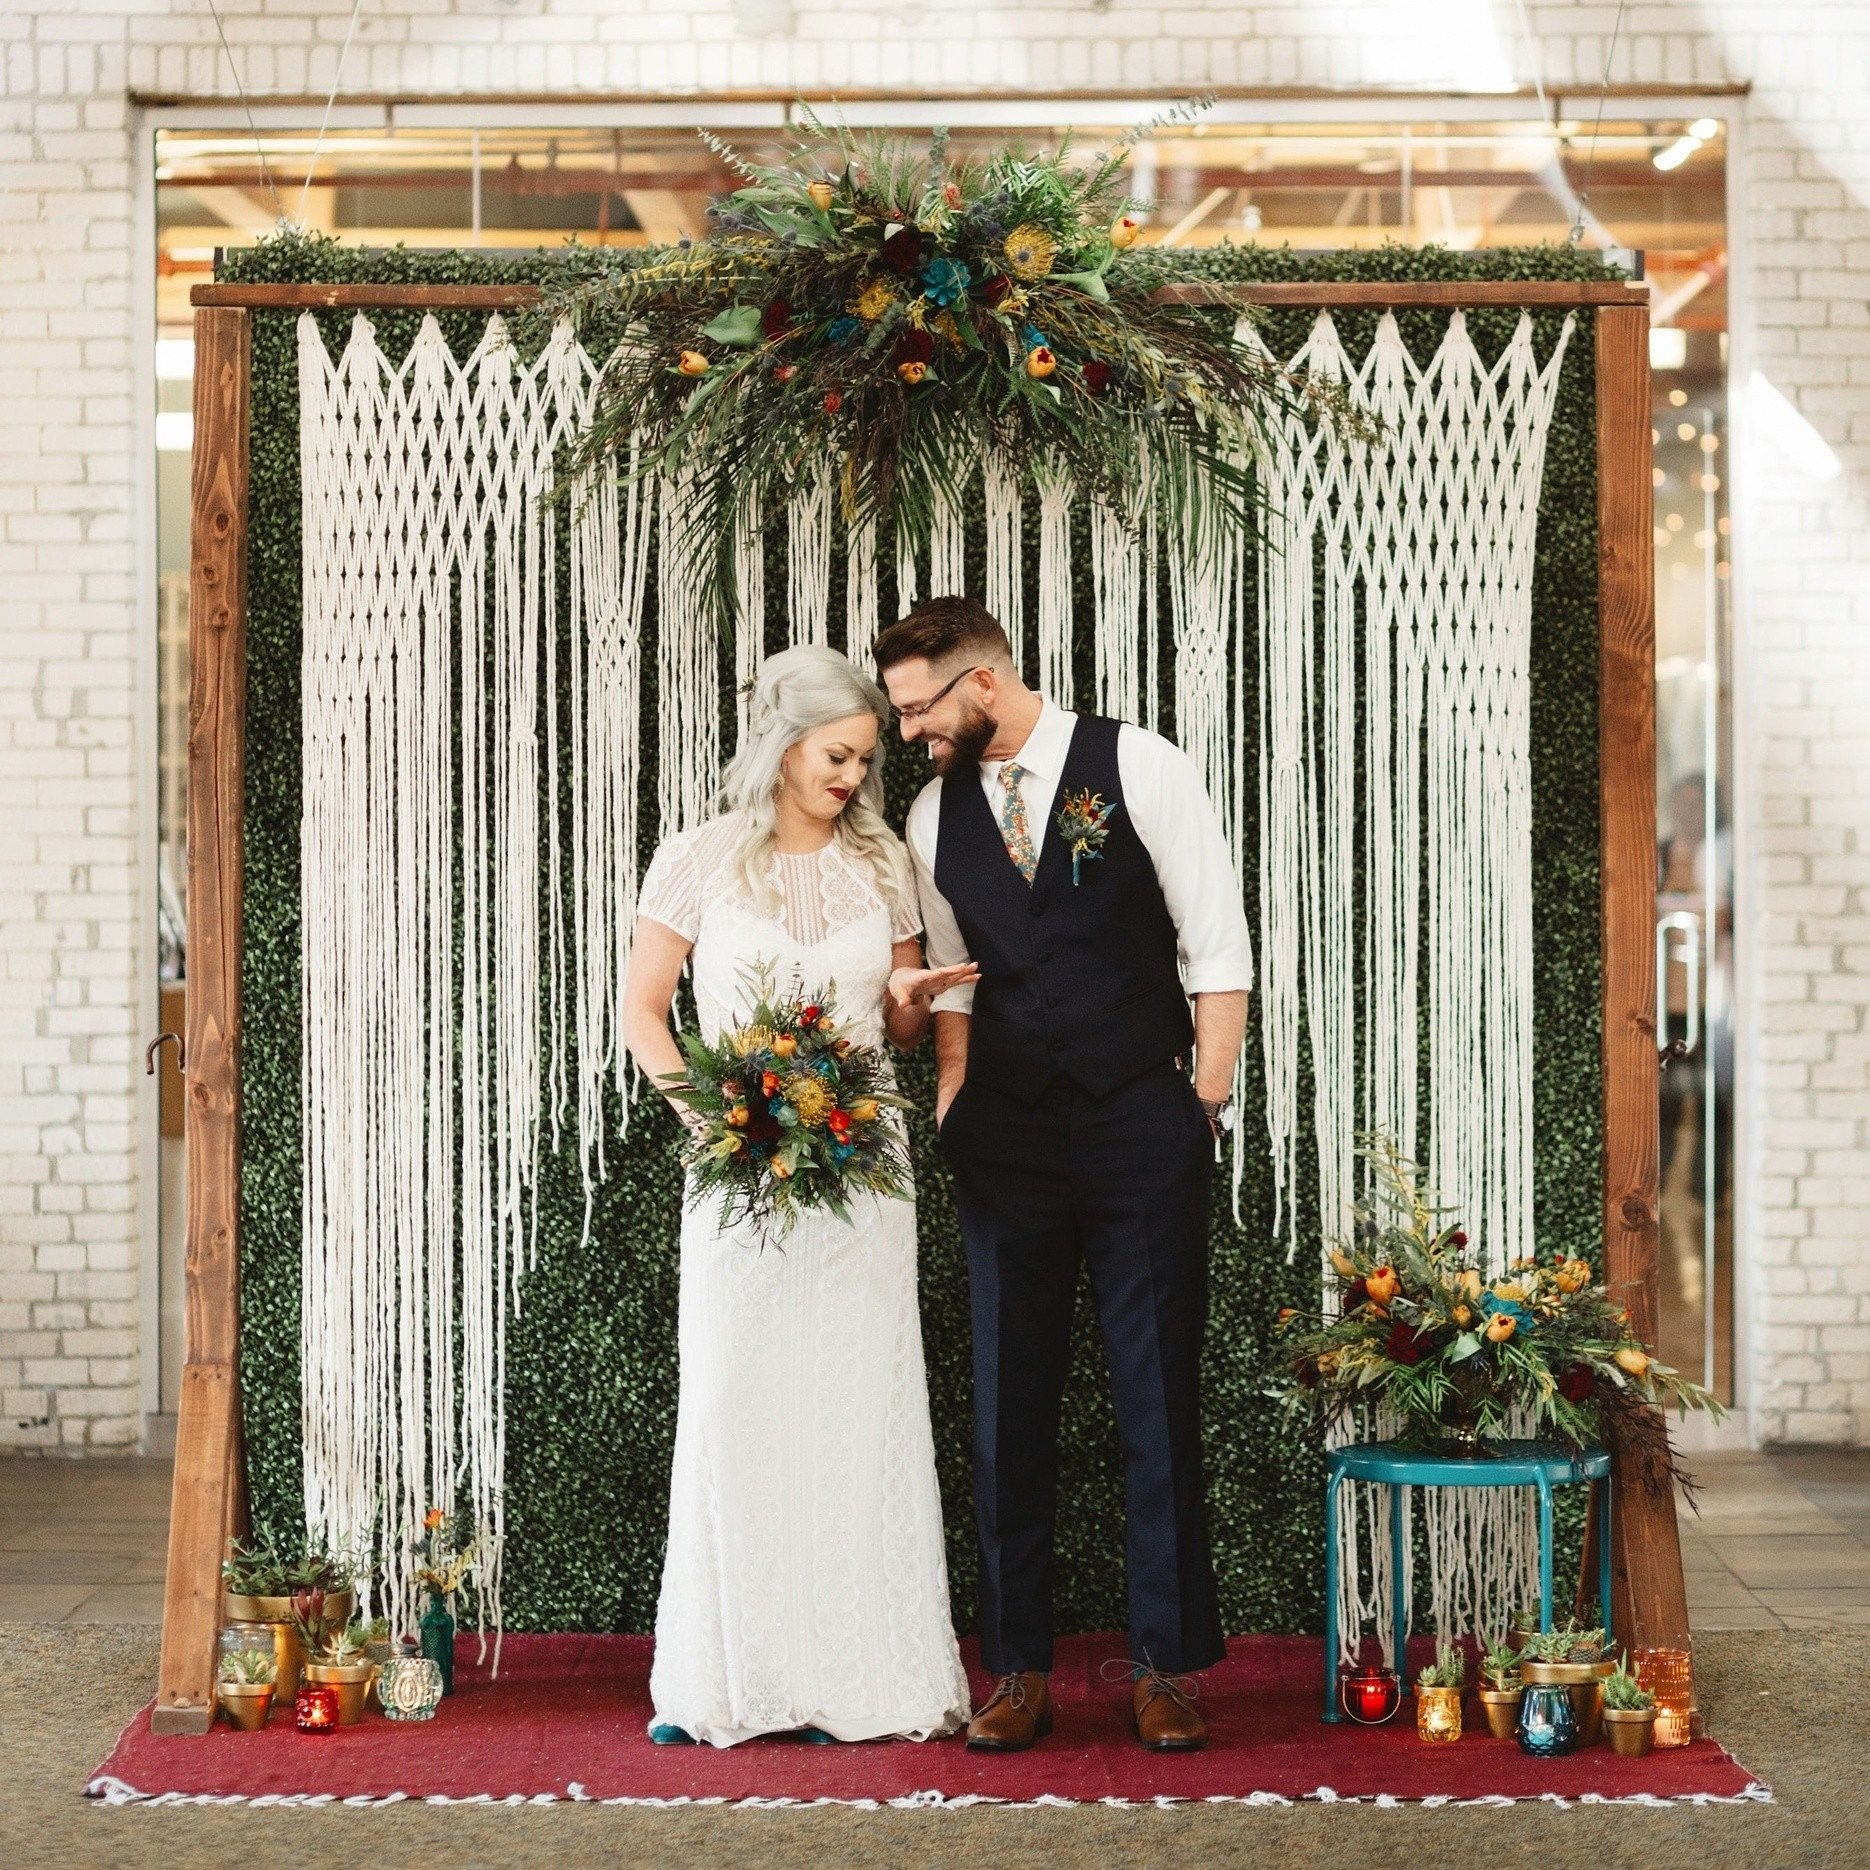 Handmade Wedding Altar: Handmade Wedding Backdrop Decor Rustic Bohemian Hanging